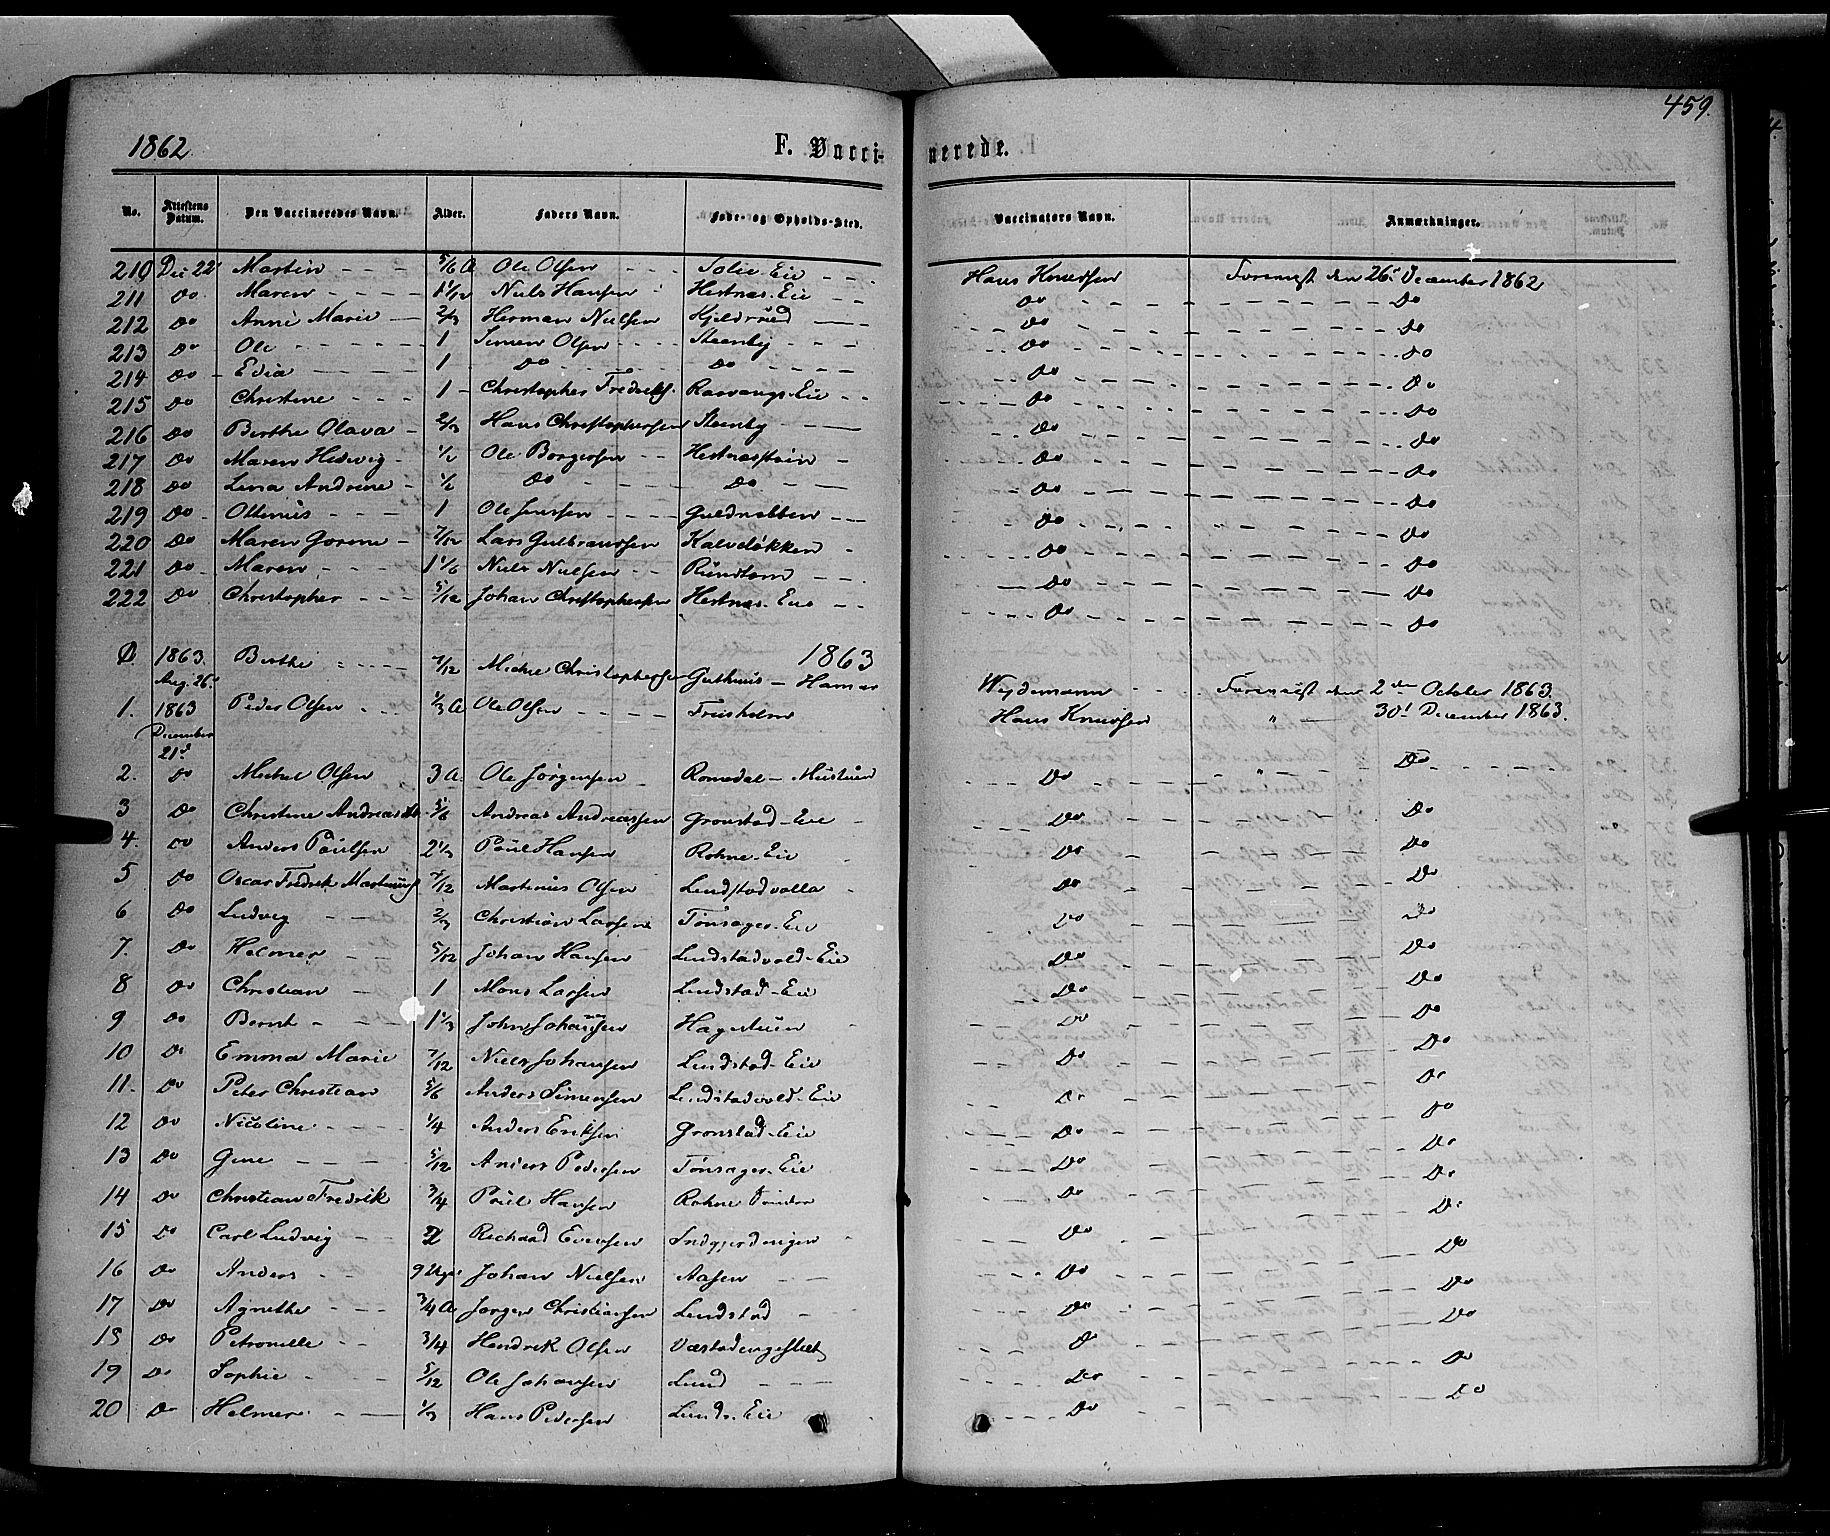 SAH, Stange prestekontor, K/L0013: Ministerialbok nr. 13, 1862-1879, s. 459